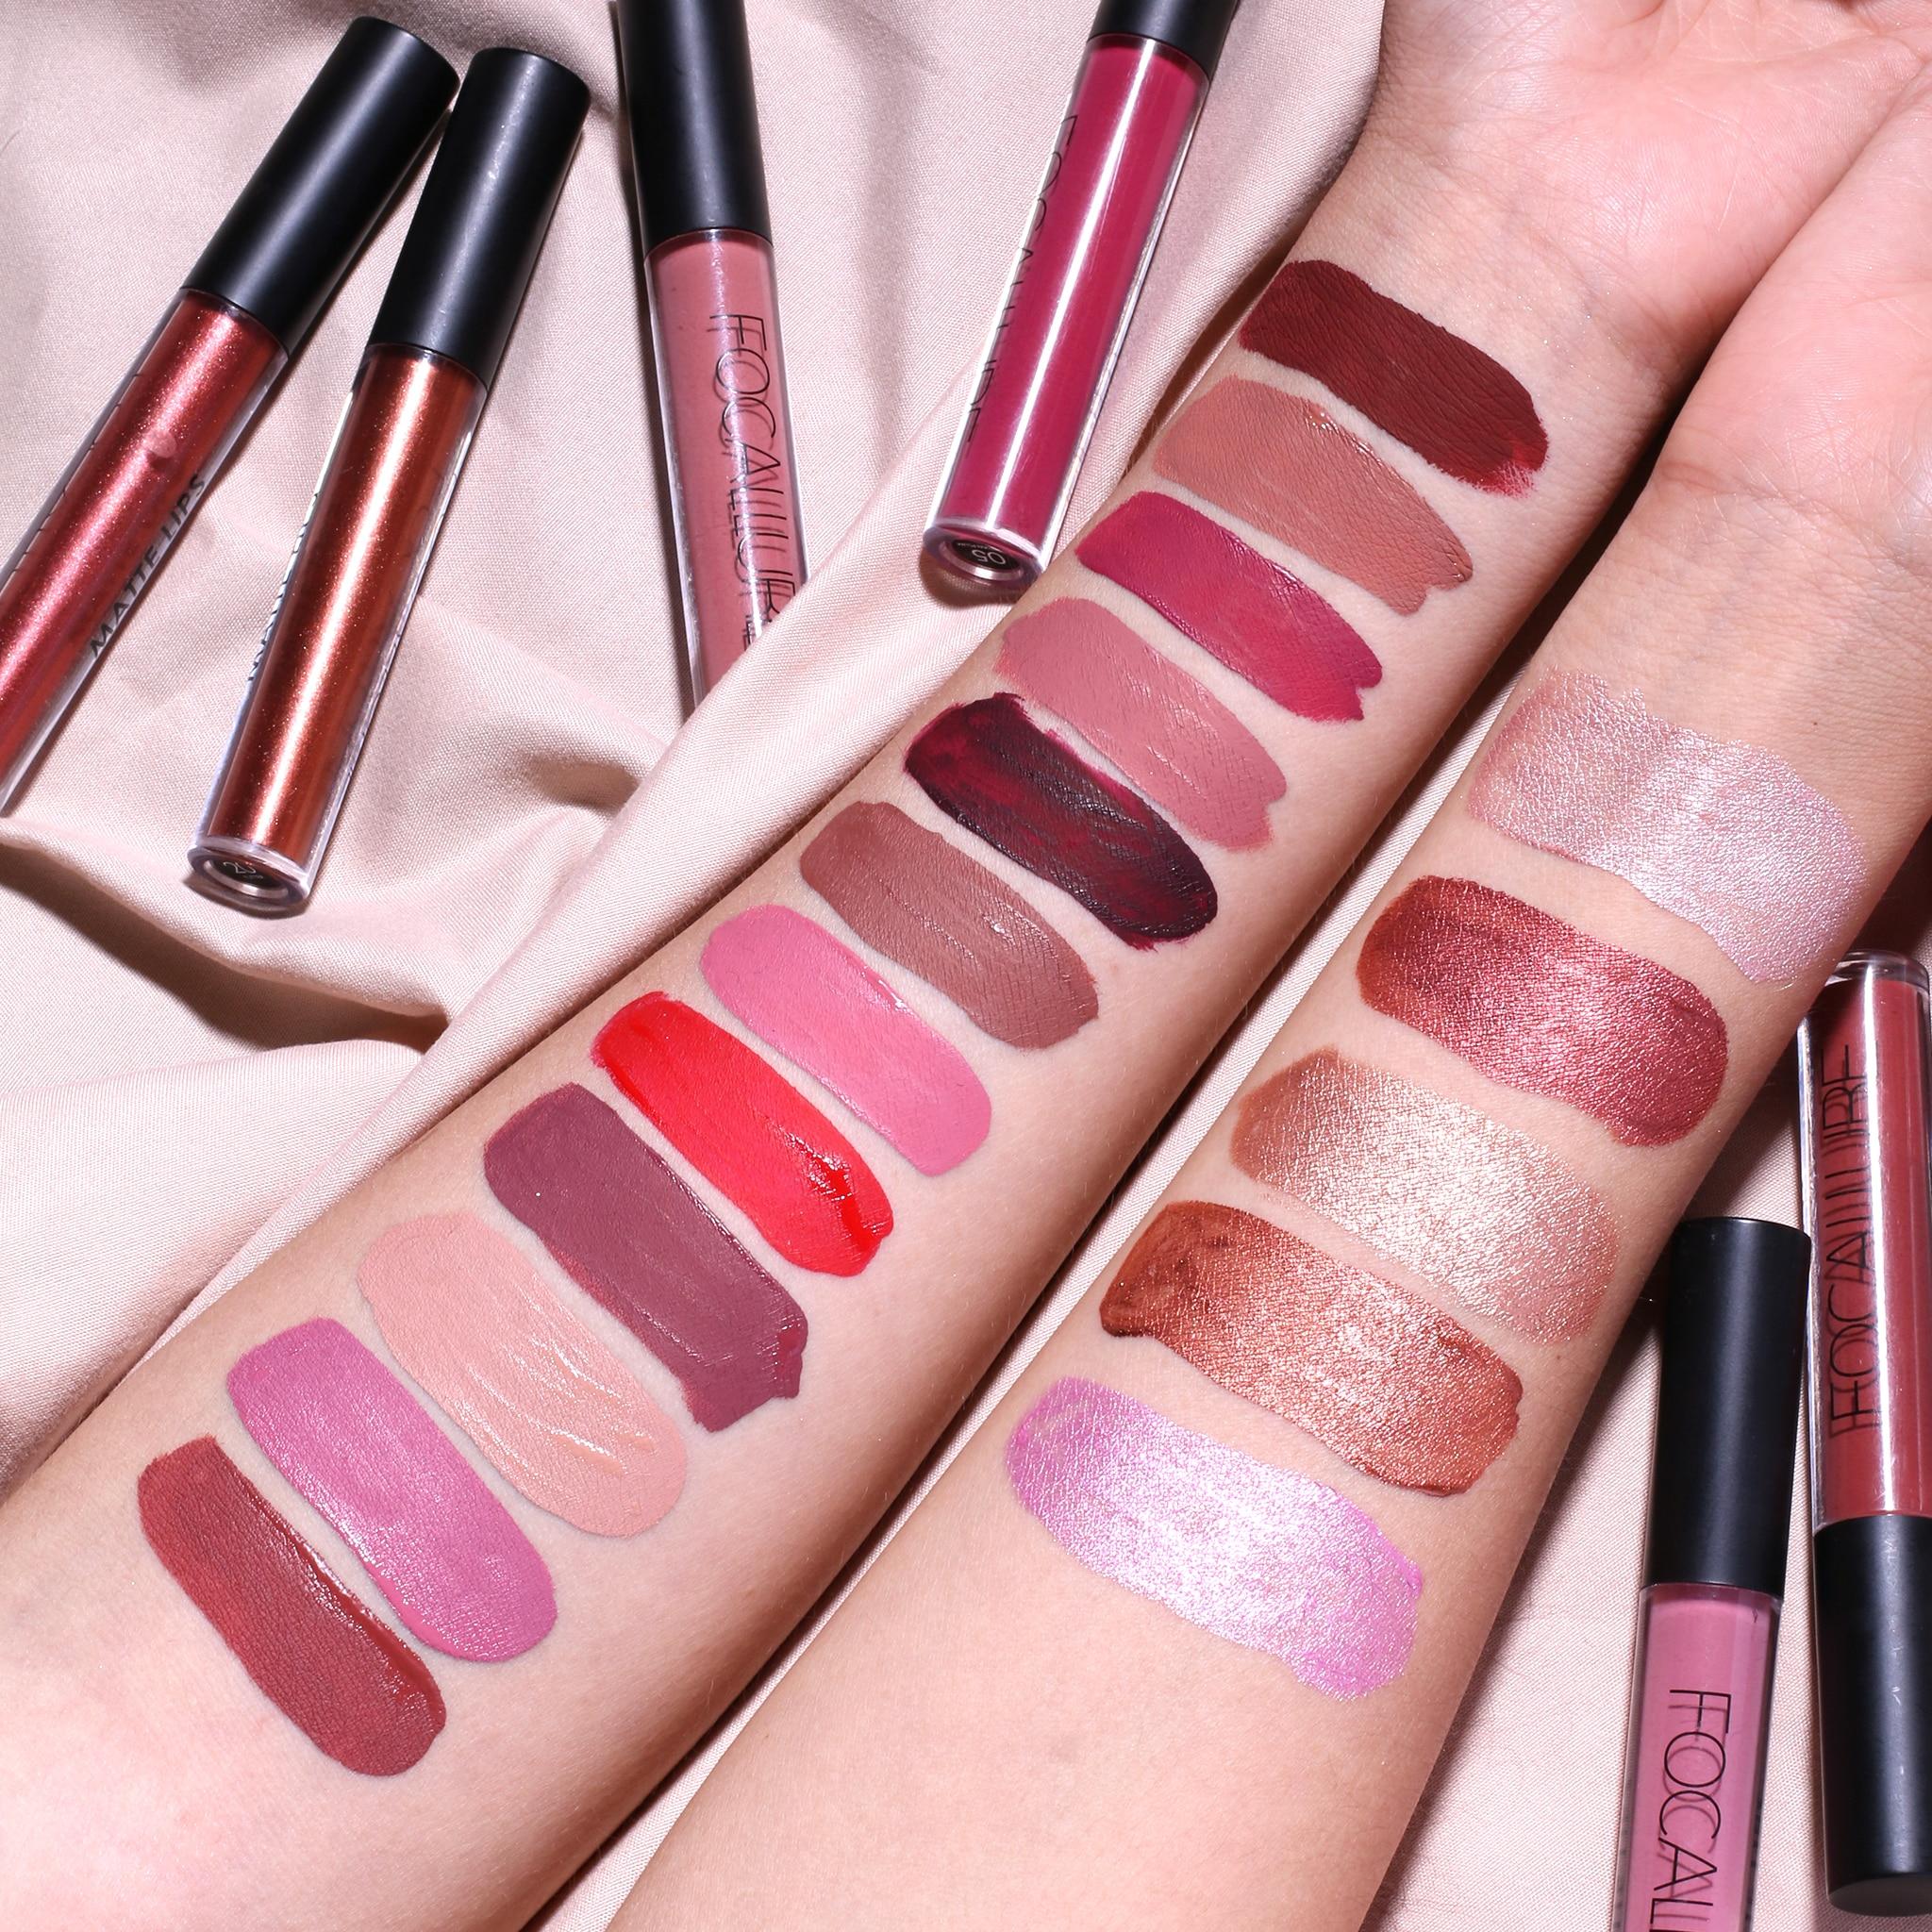 New Brand Lip Gloss Matte Shining Gloss waterproof  Magic Color Peel Mask Tint Pack Long Lasting Makeup lips